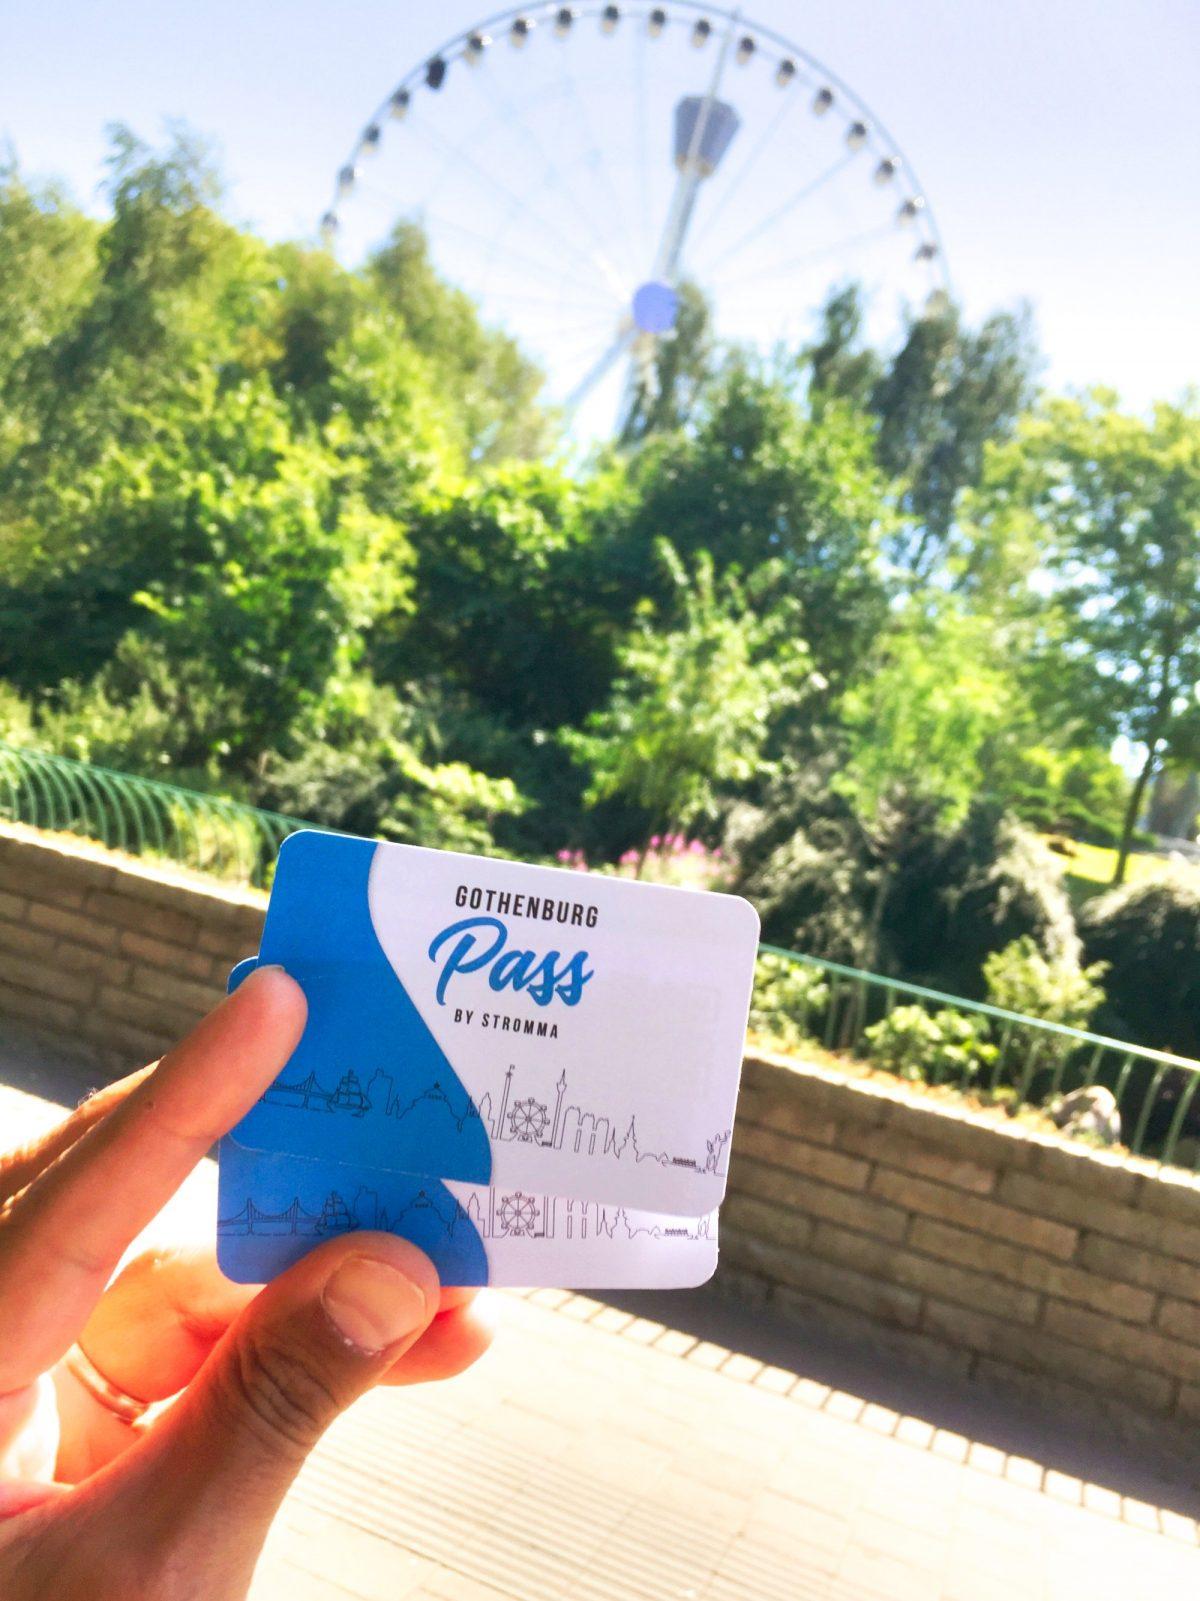 Gothenburg Pass, tu tarjeta para visitar Gotemburgo <br> Foto: Israel Úbeda / sweetsweden.com